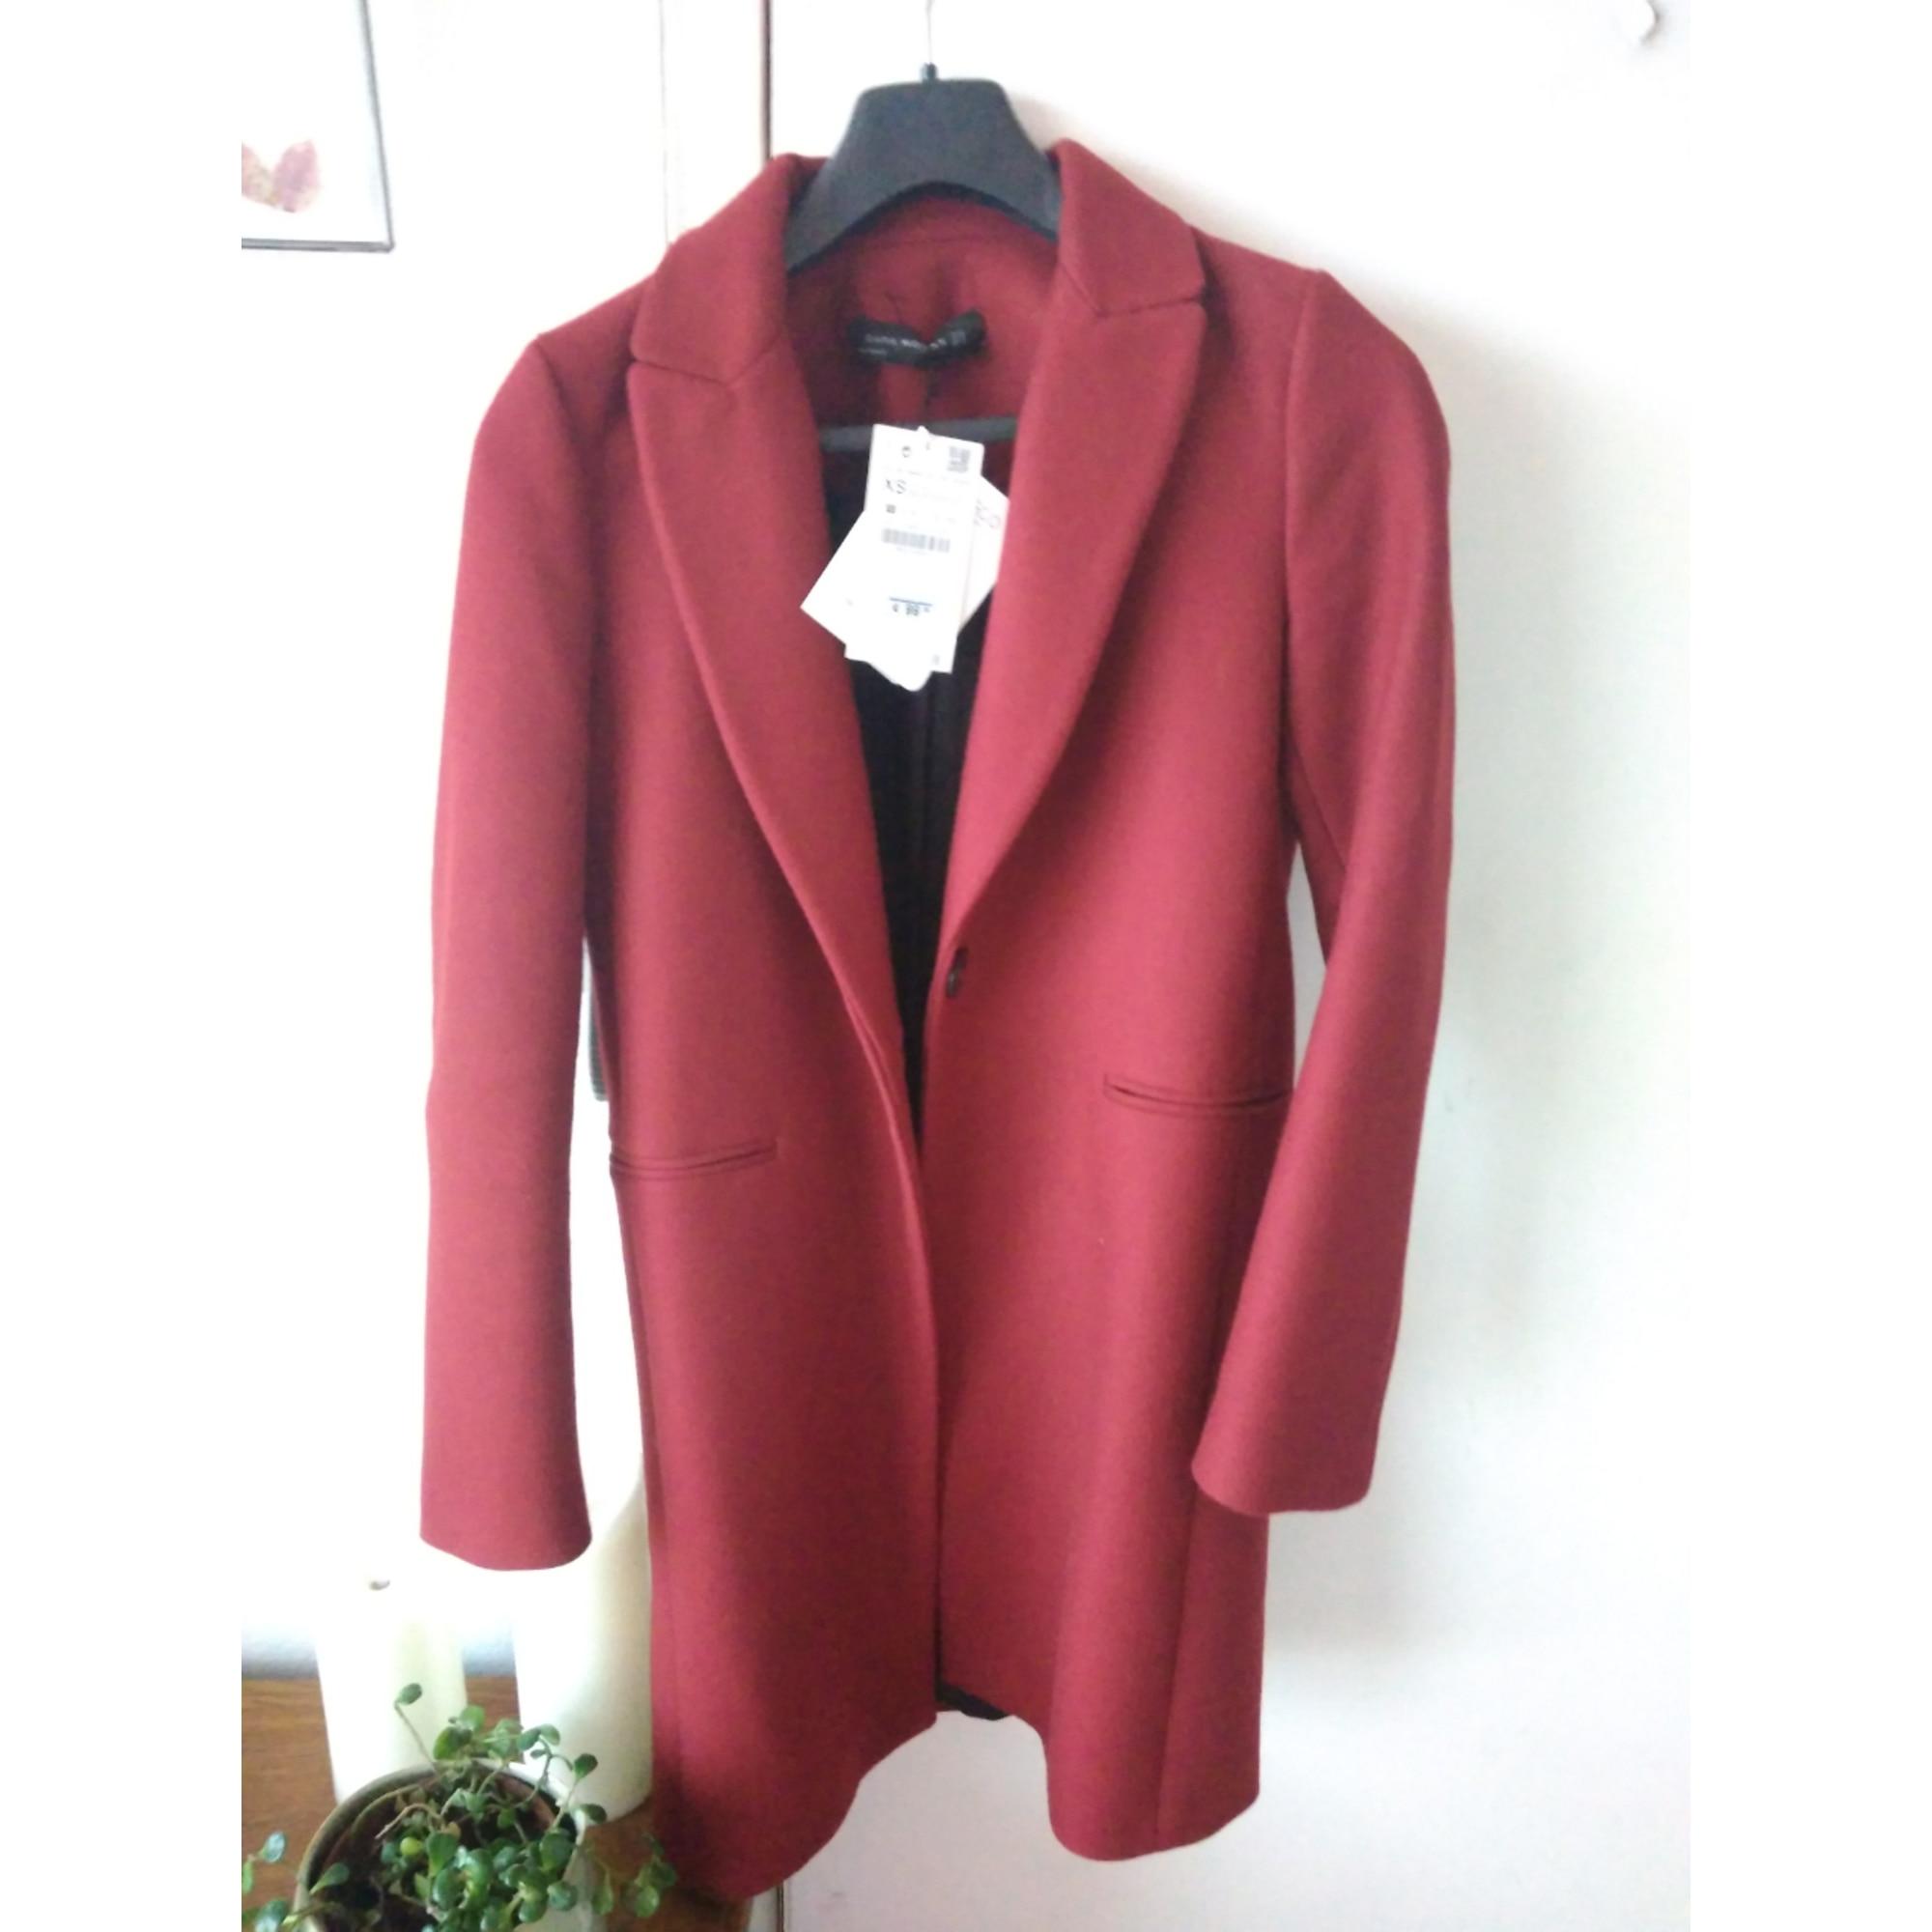 zara en femme manteau laine bordeau CedBroxW